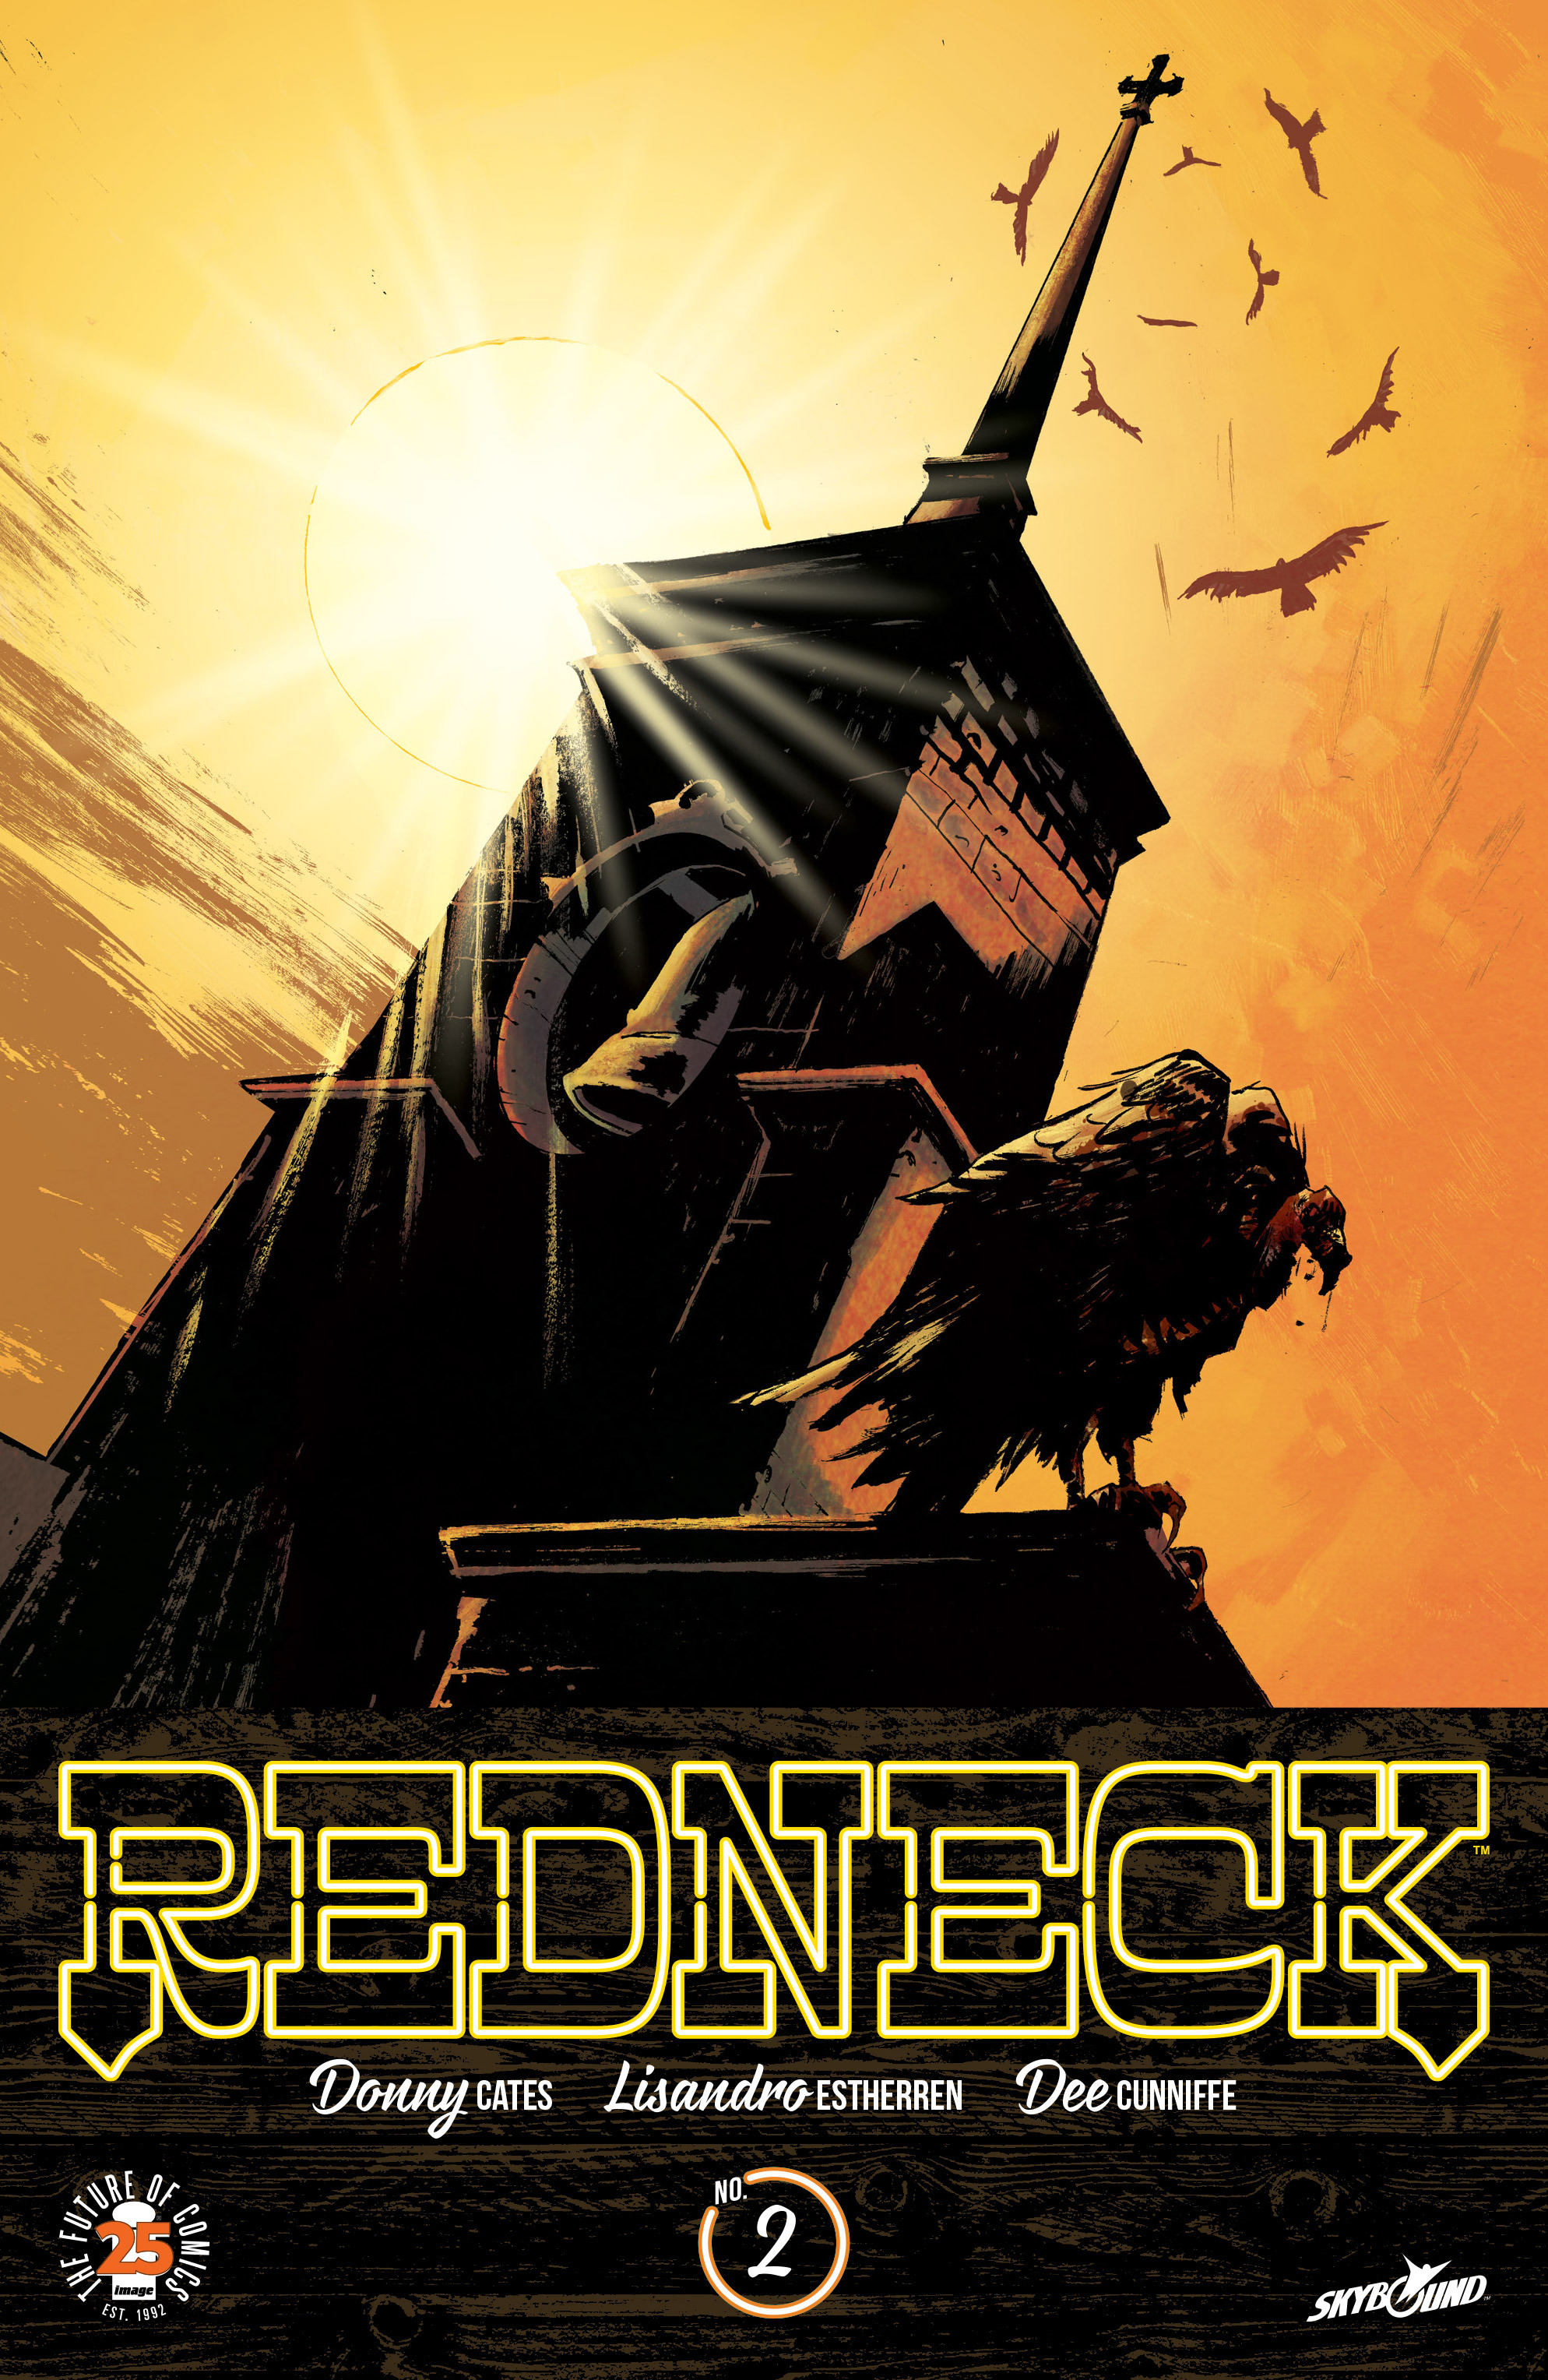 Read online Redneck comic -  Issue #2 - 1